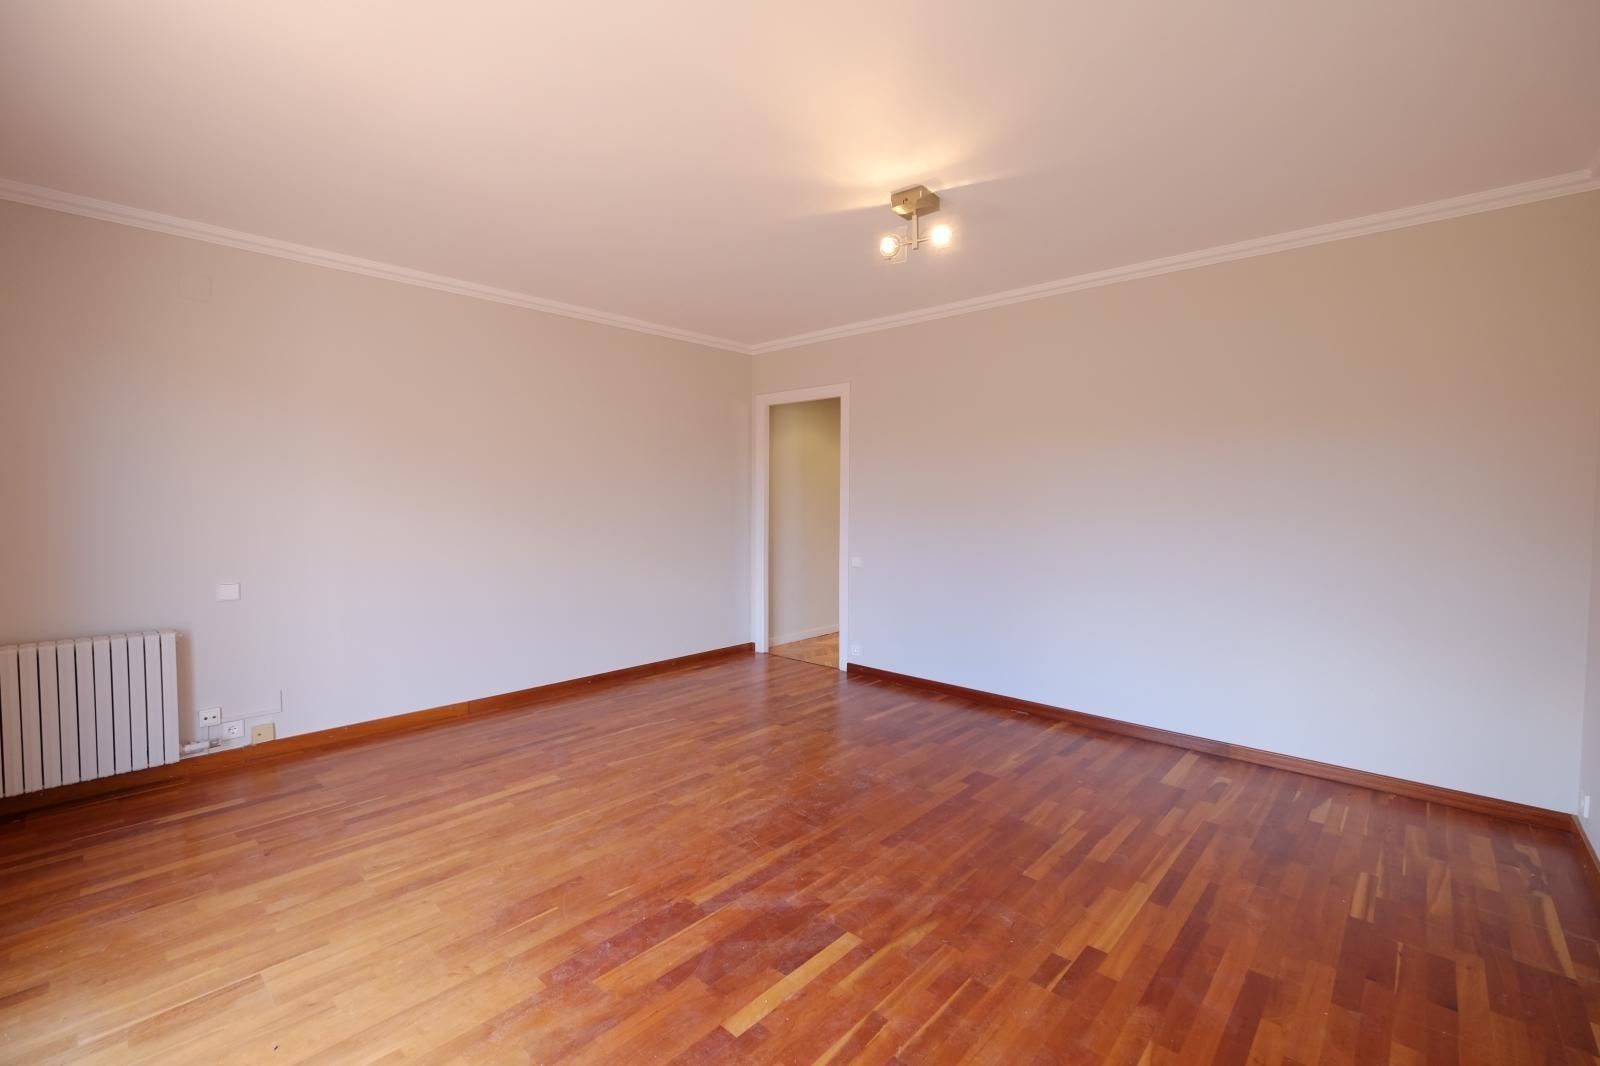 MG Inmobiliaria Barcelona - raset-modolell